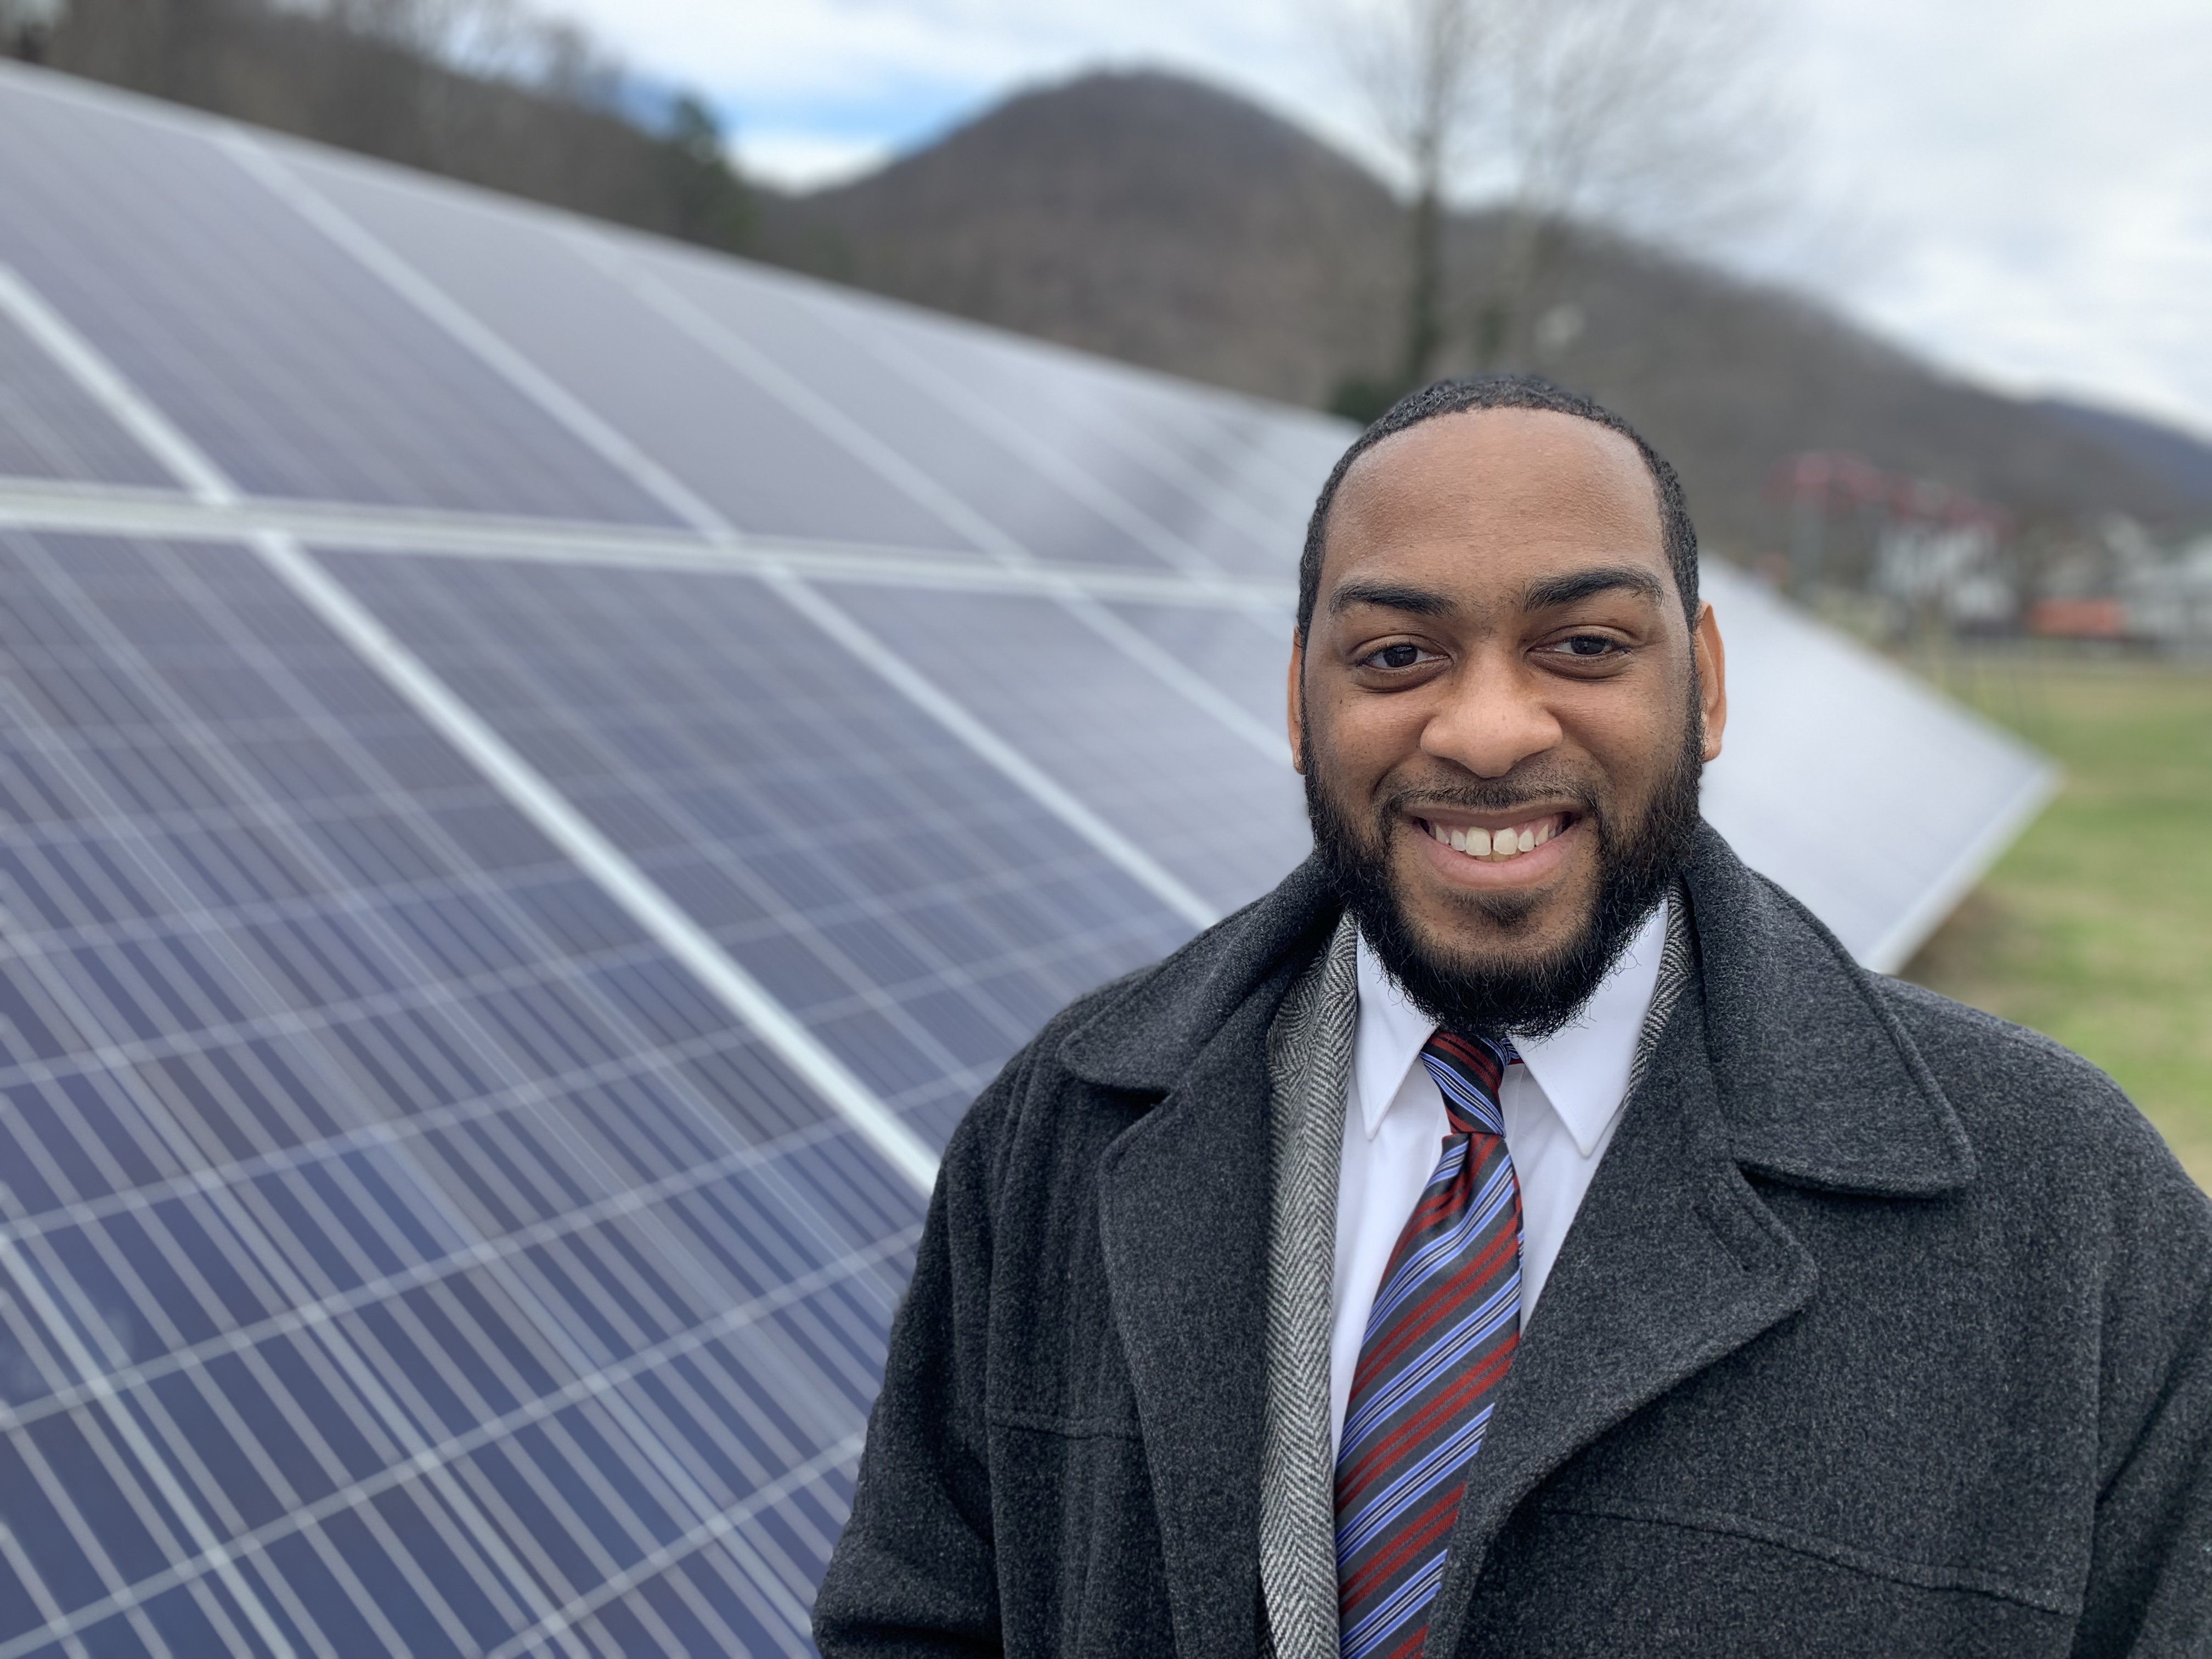 charles_solar_panels